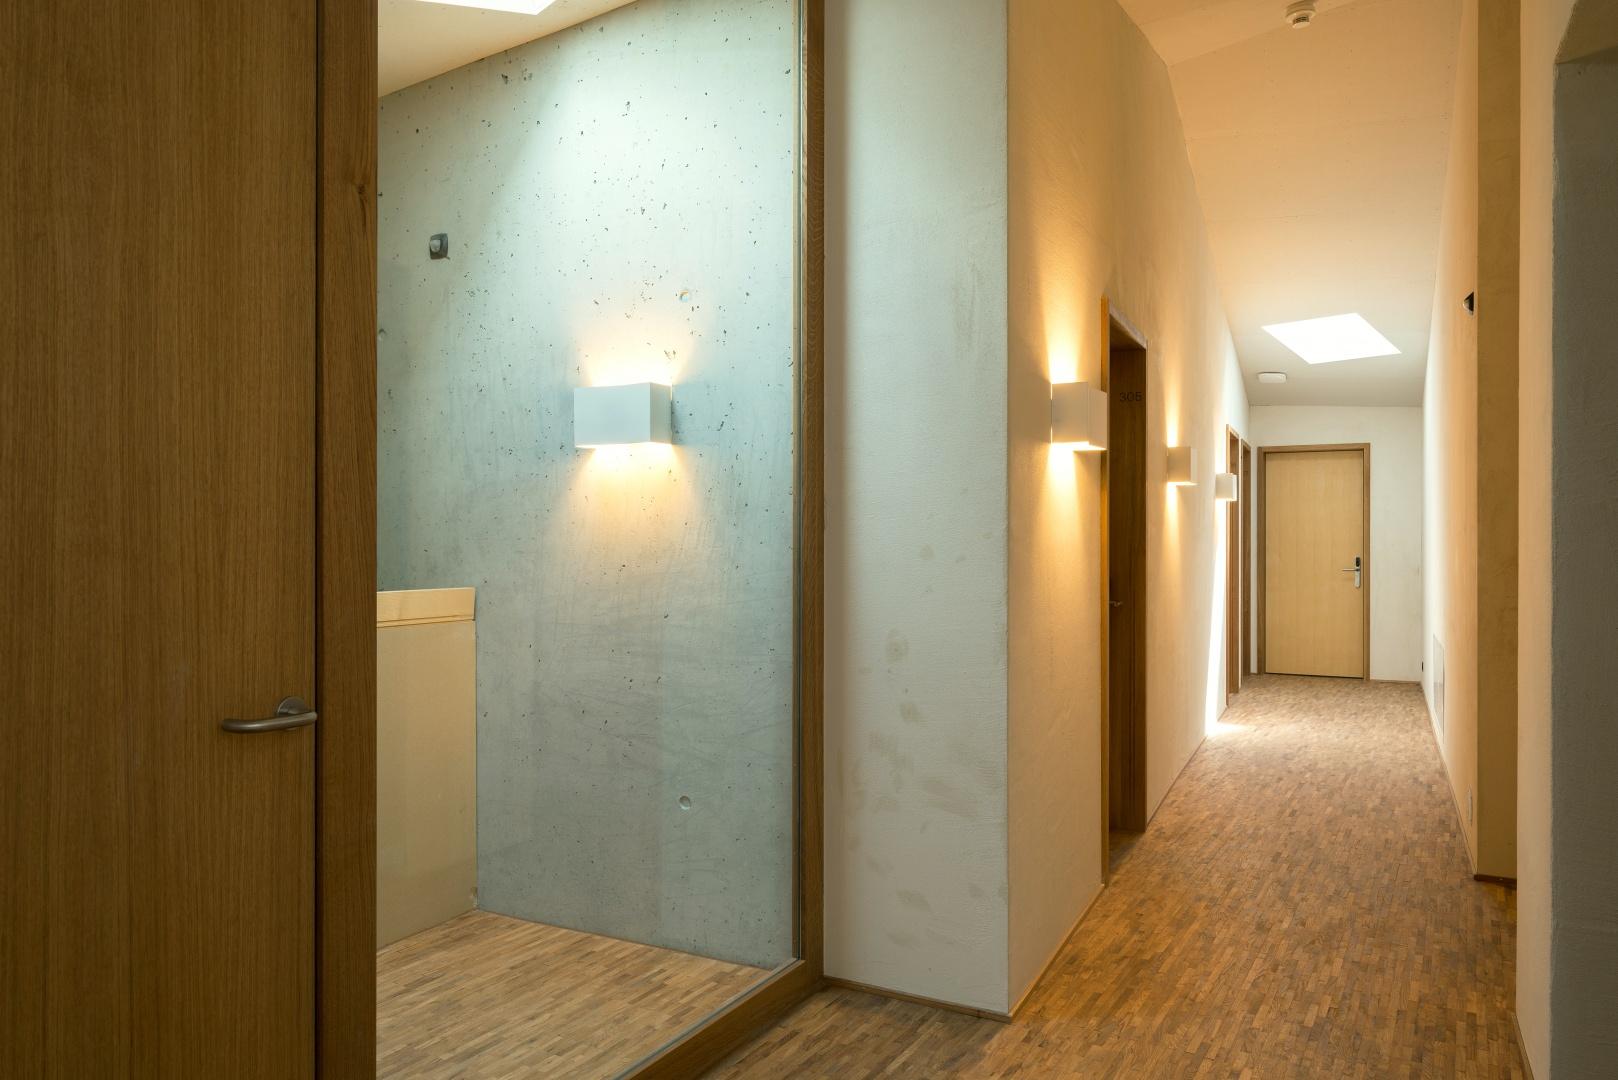 Korridor © Alexander Gempeler, Bern